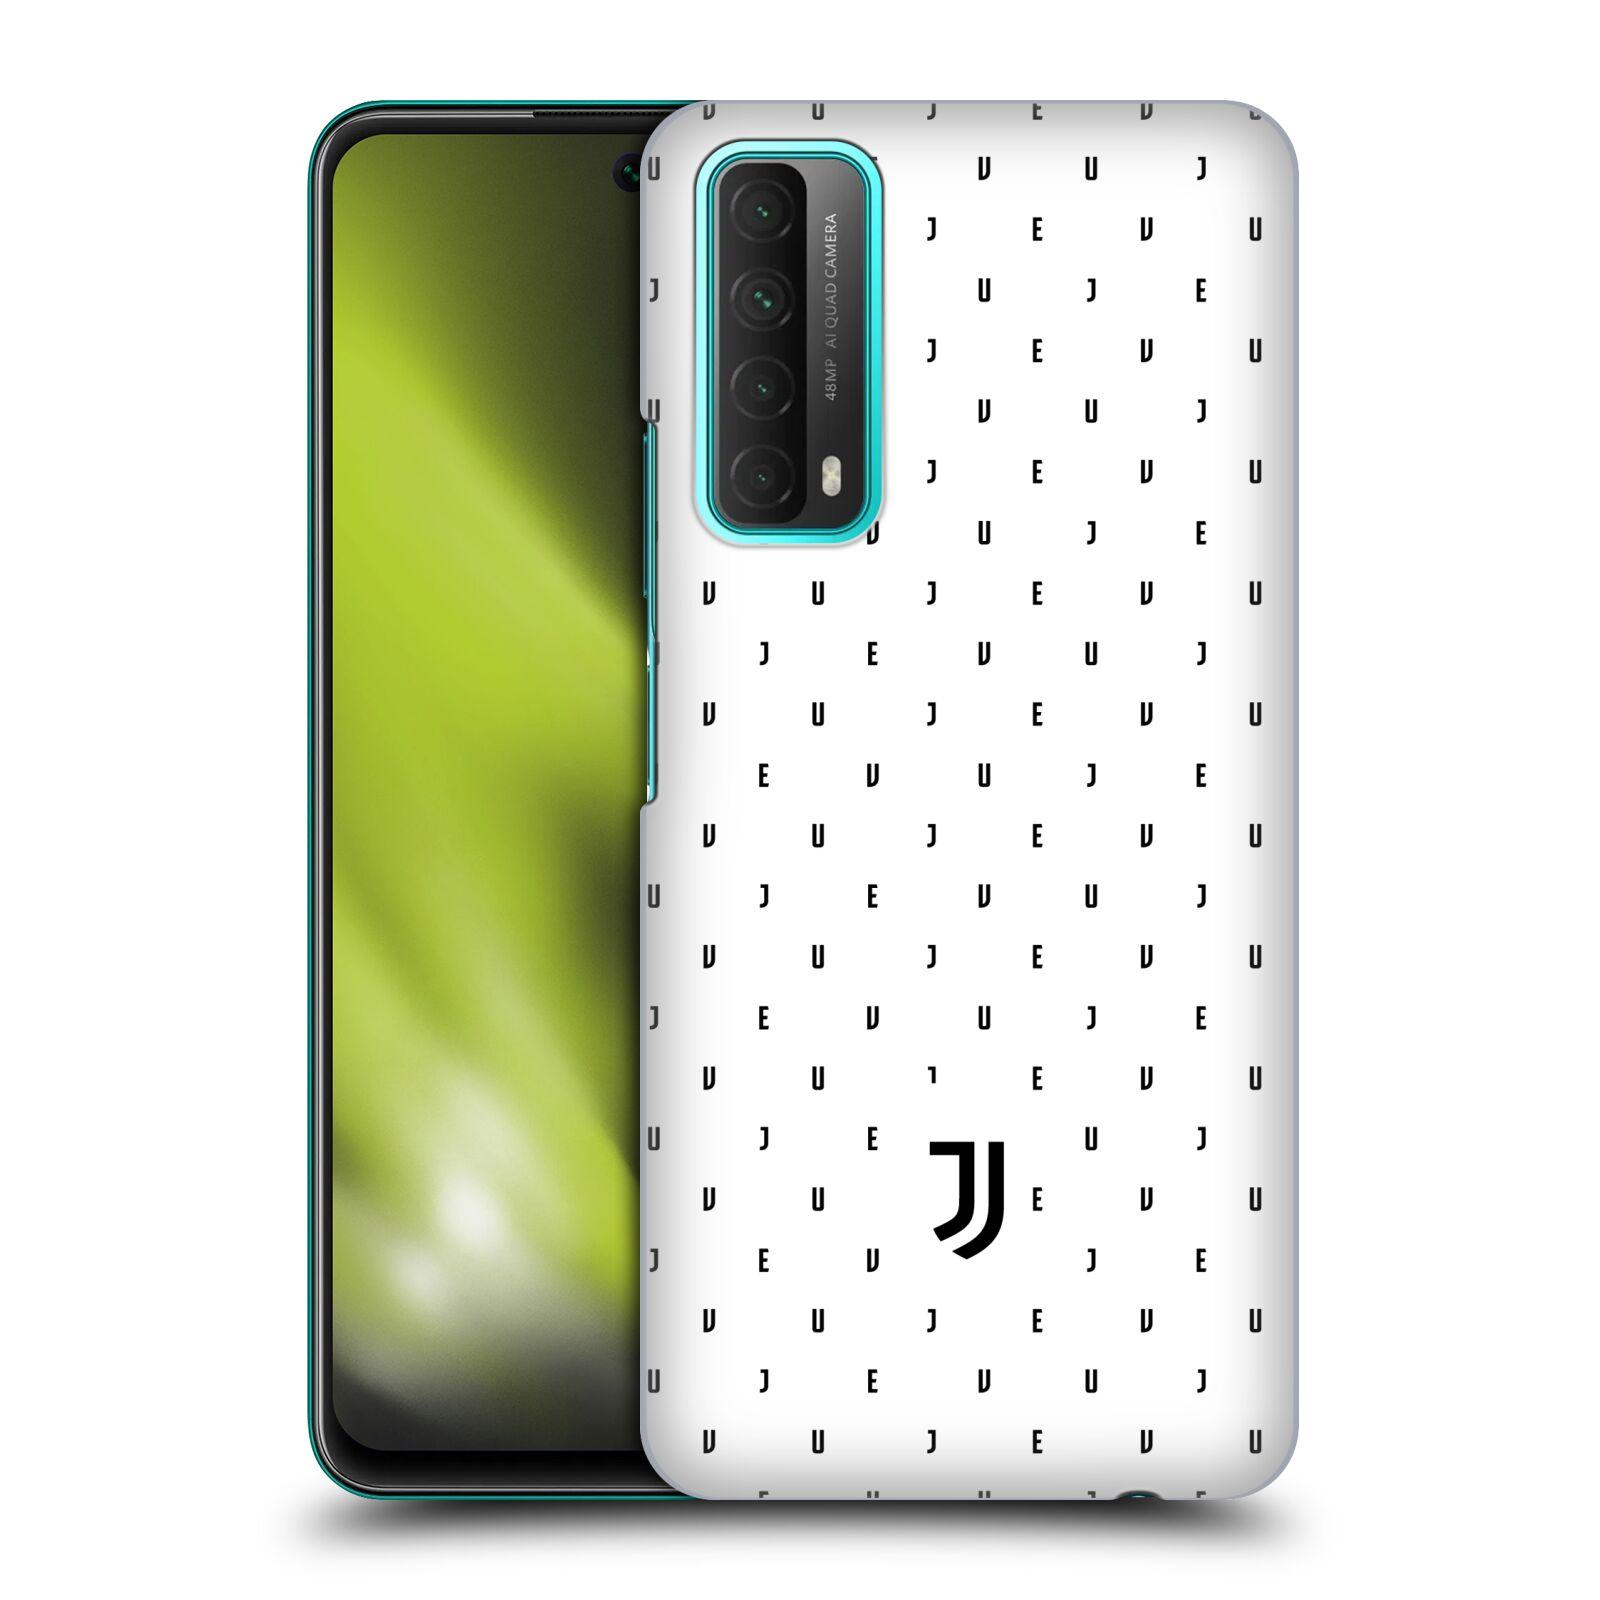 Plastové pouzdro na mobil Huawei P Smart (2021) - Head Case - Juventus FC - Nové logo - Decentní